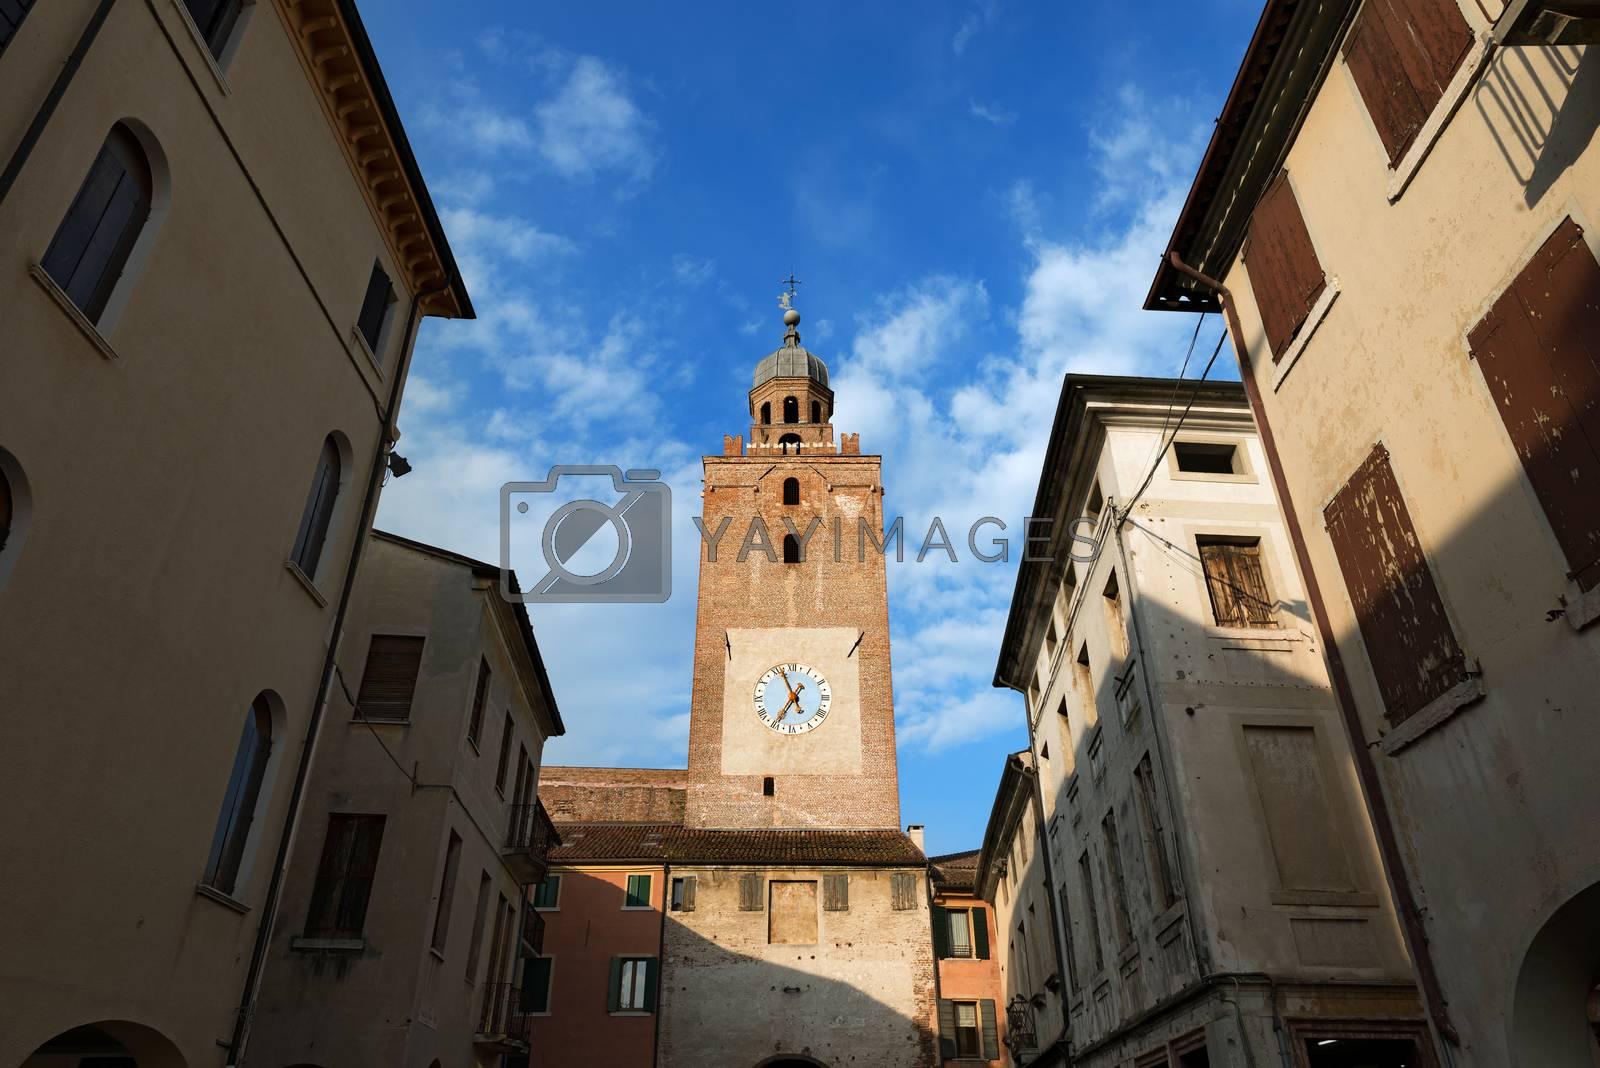 Torre Civica - Castelfranco Veneto - Italy by catalby